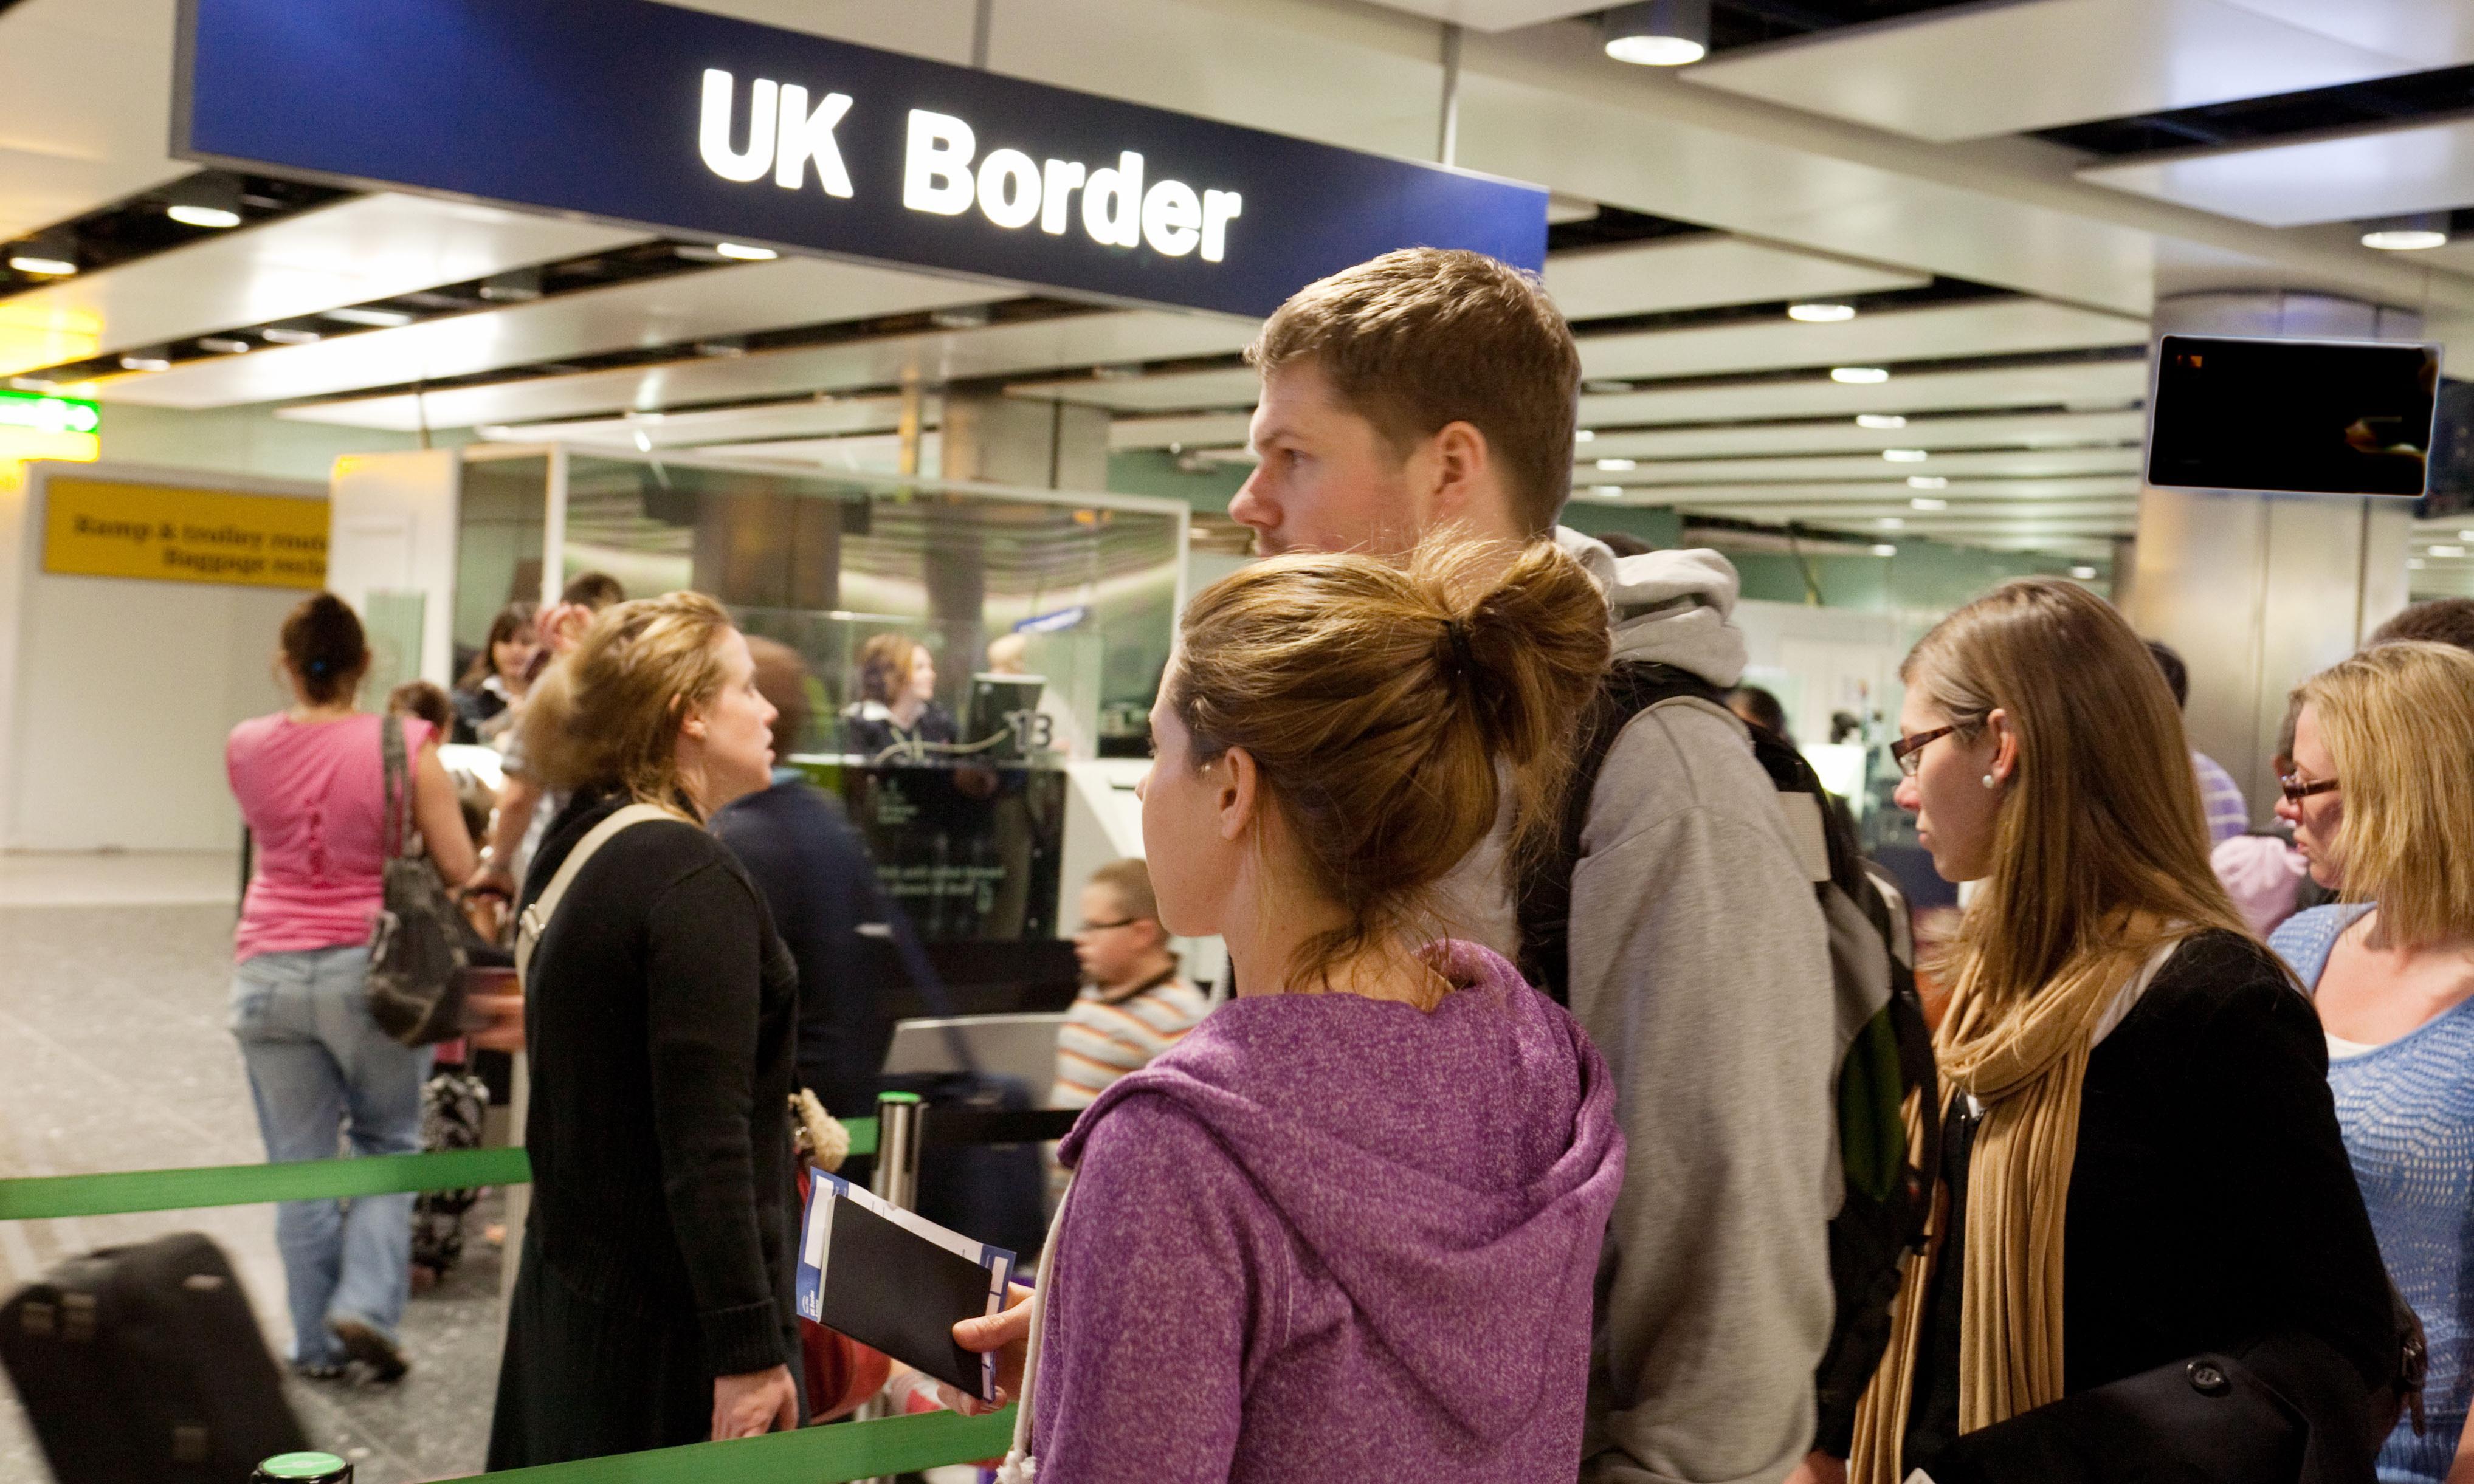 Campaigners attack Boris Johnson for EU nationals remarks